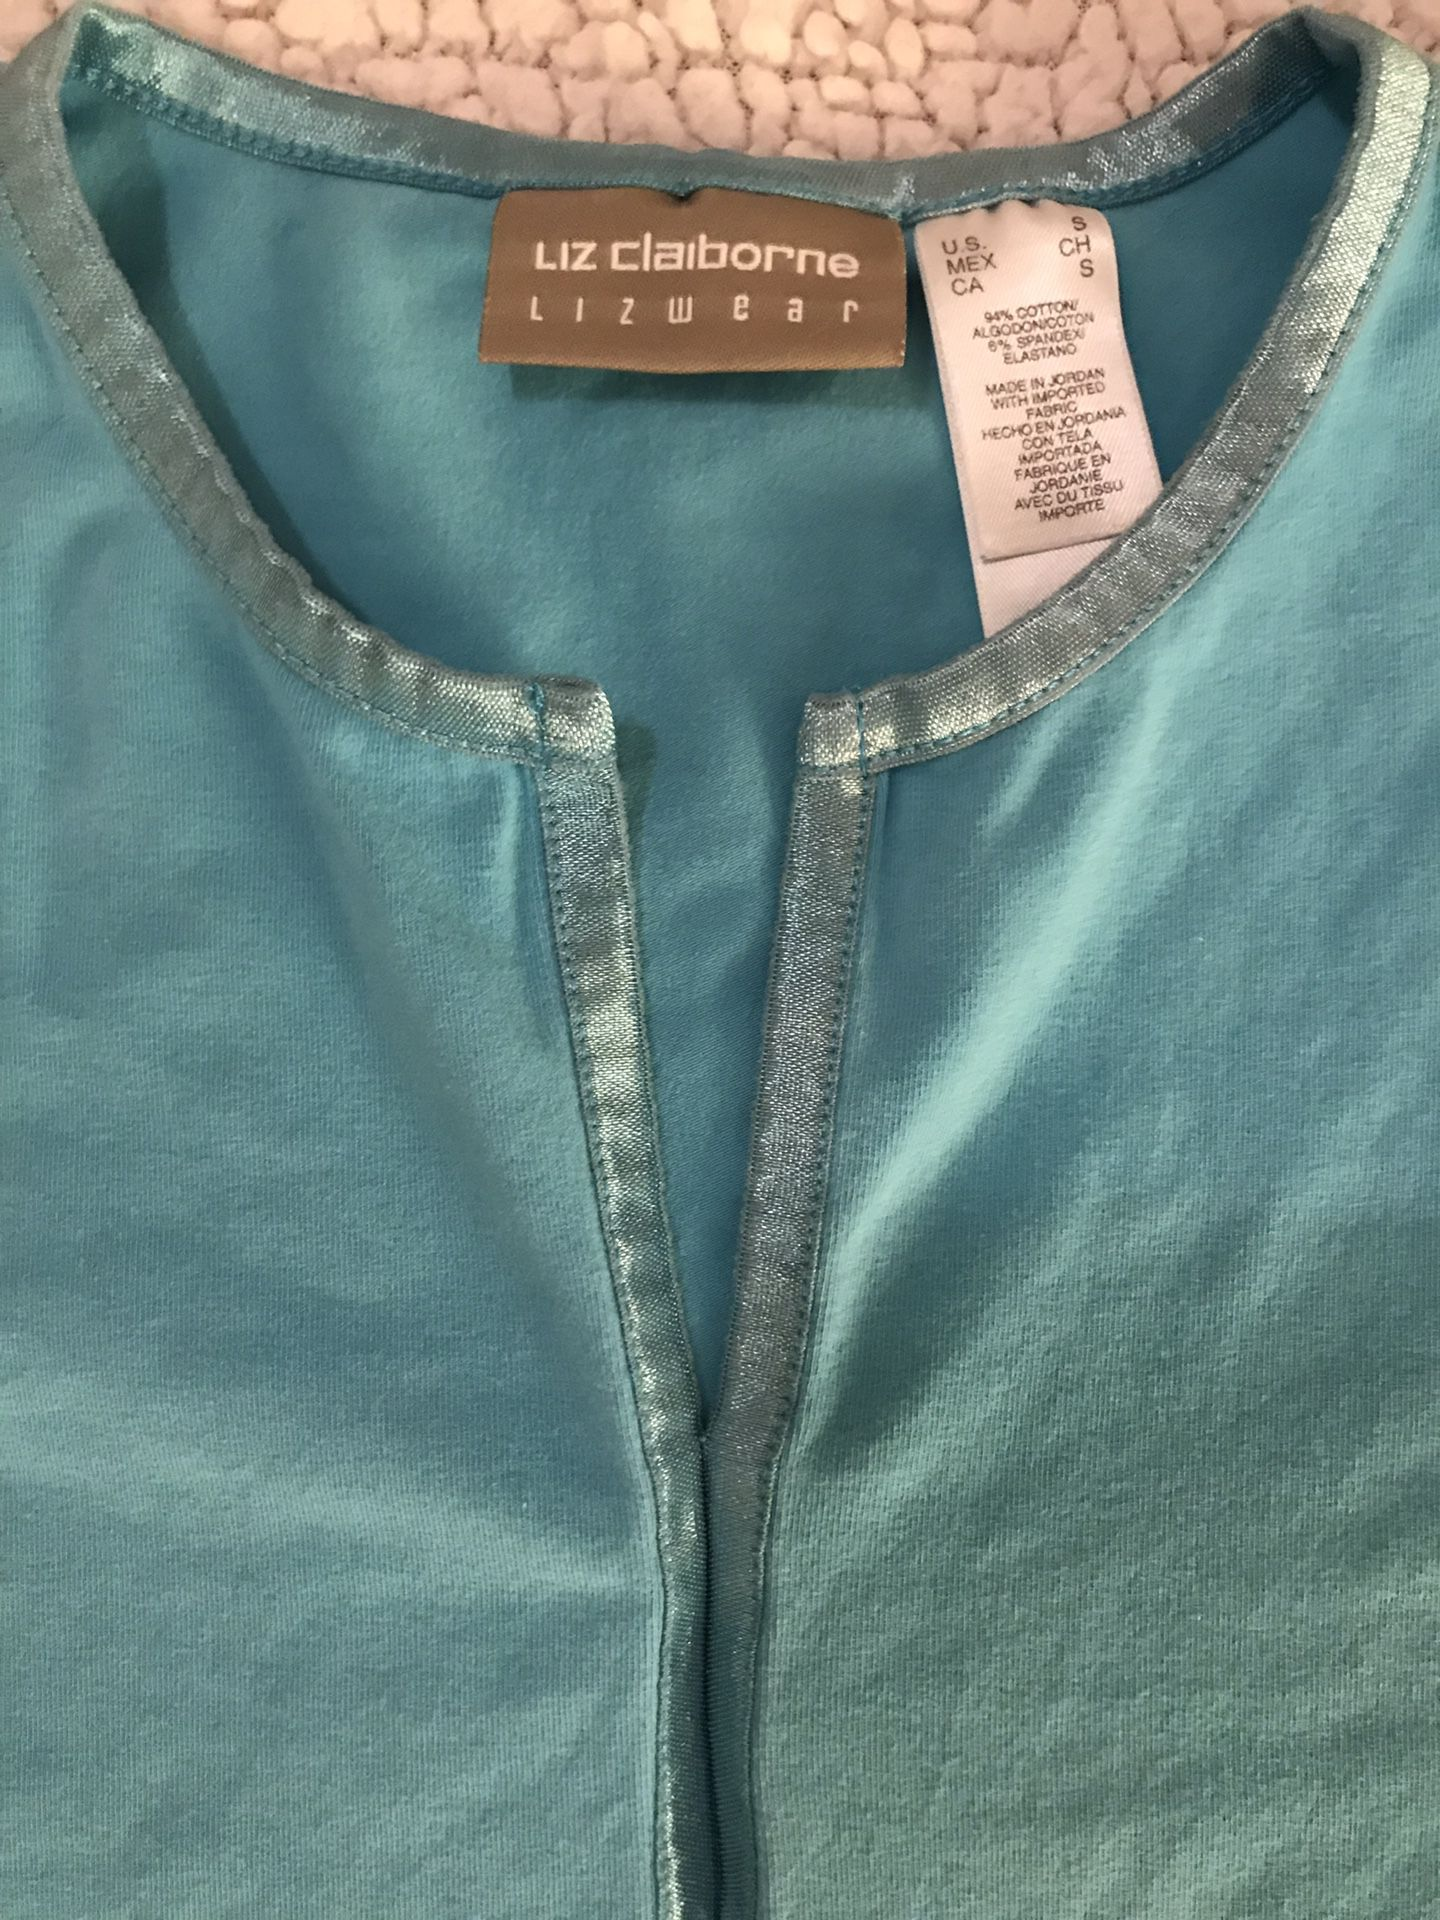 Liz Claiborne Lizwear bright blue shirt (Small)